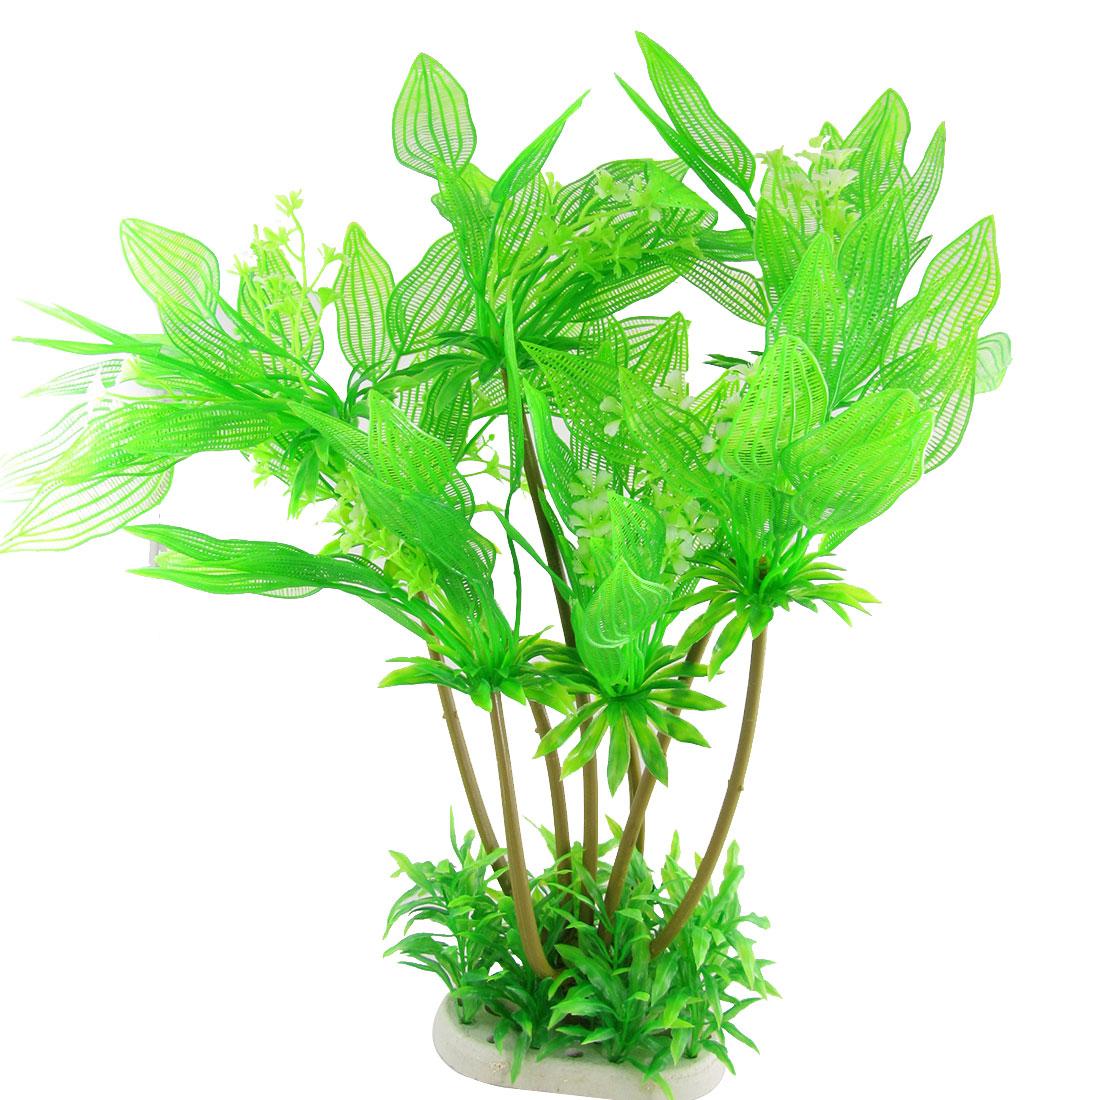 Tank Aquascape White Floral Green Plastic Plants Ornament